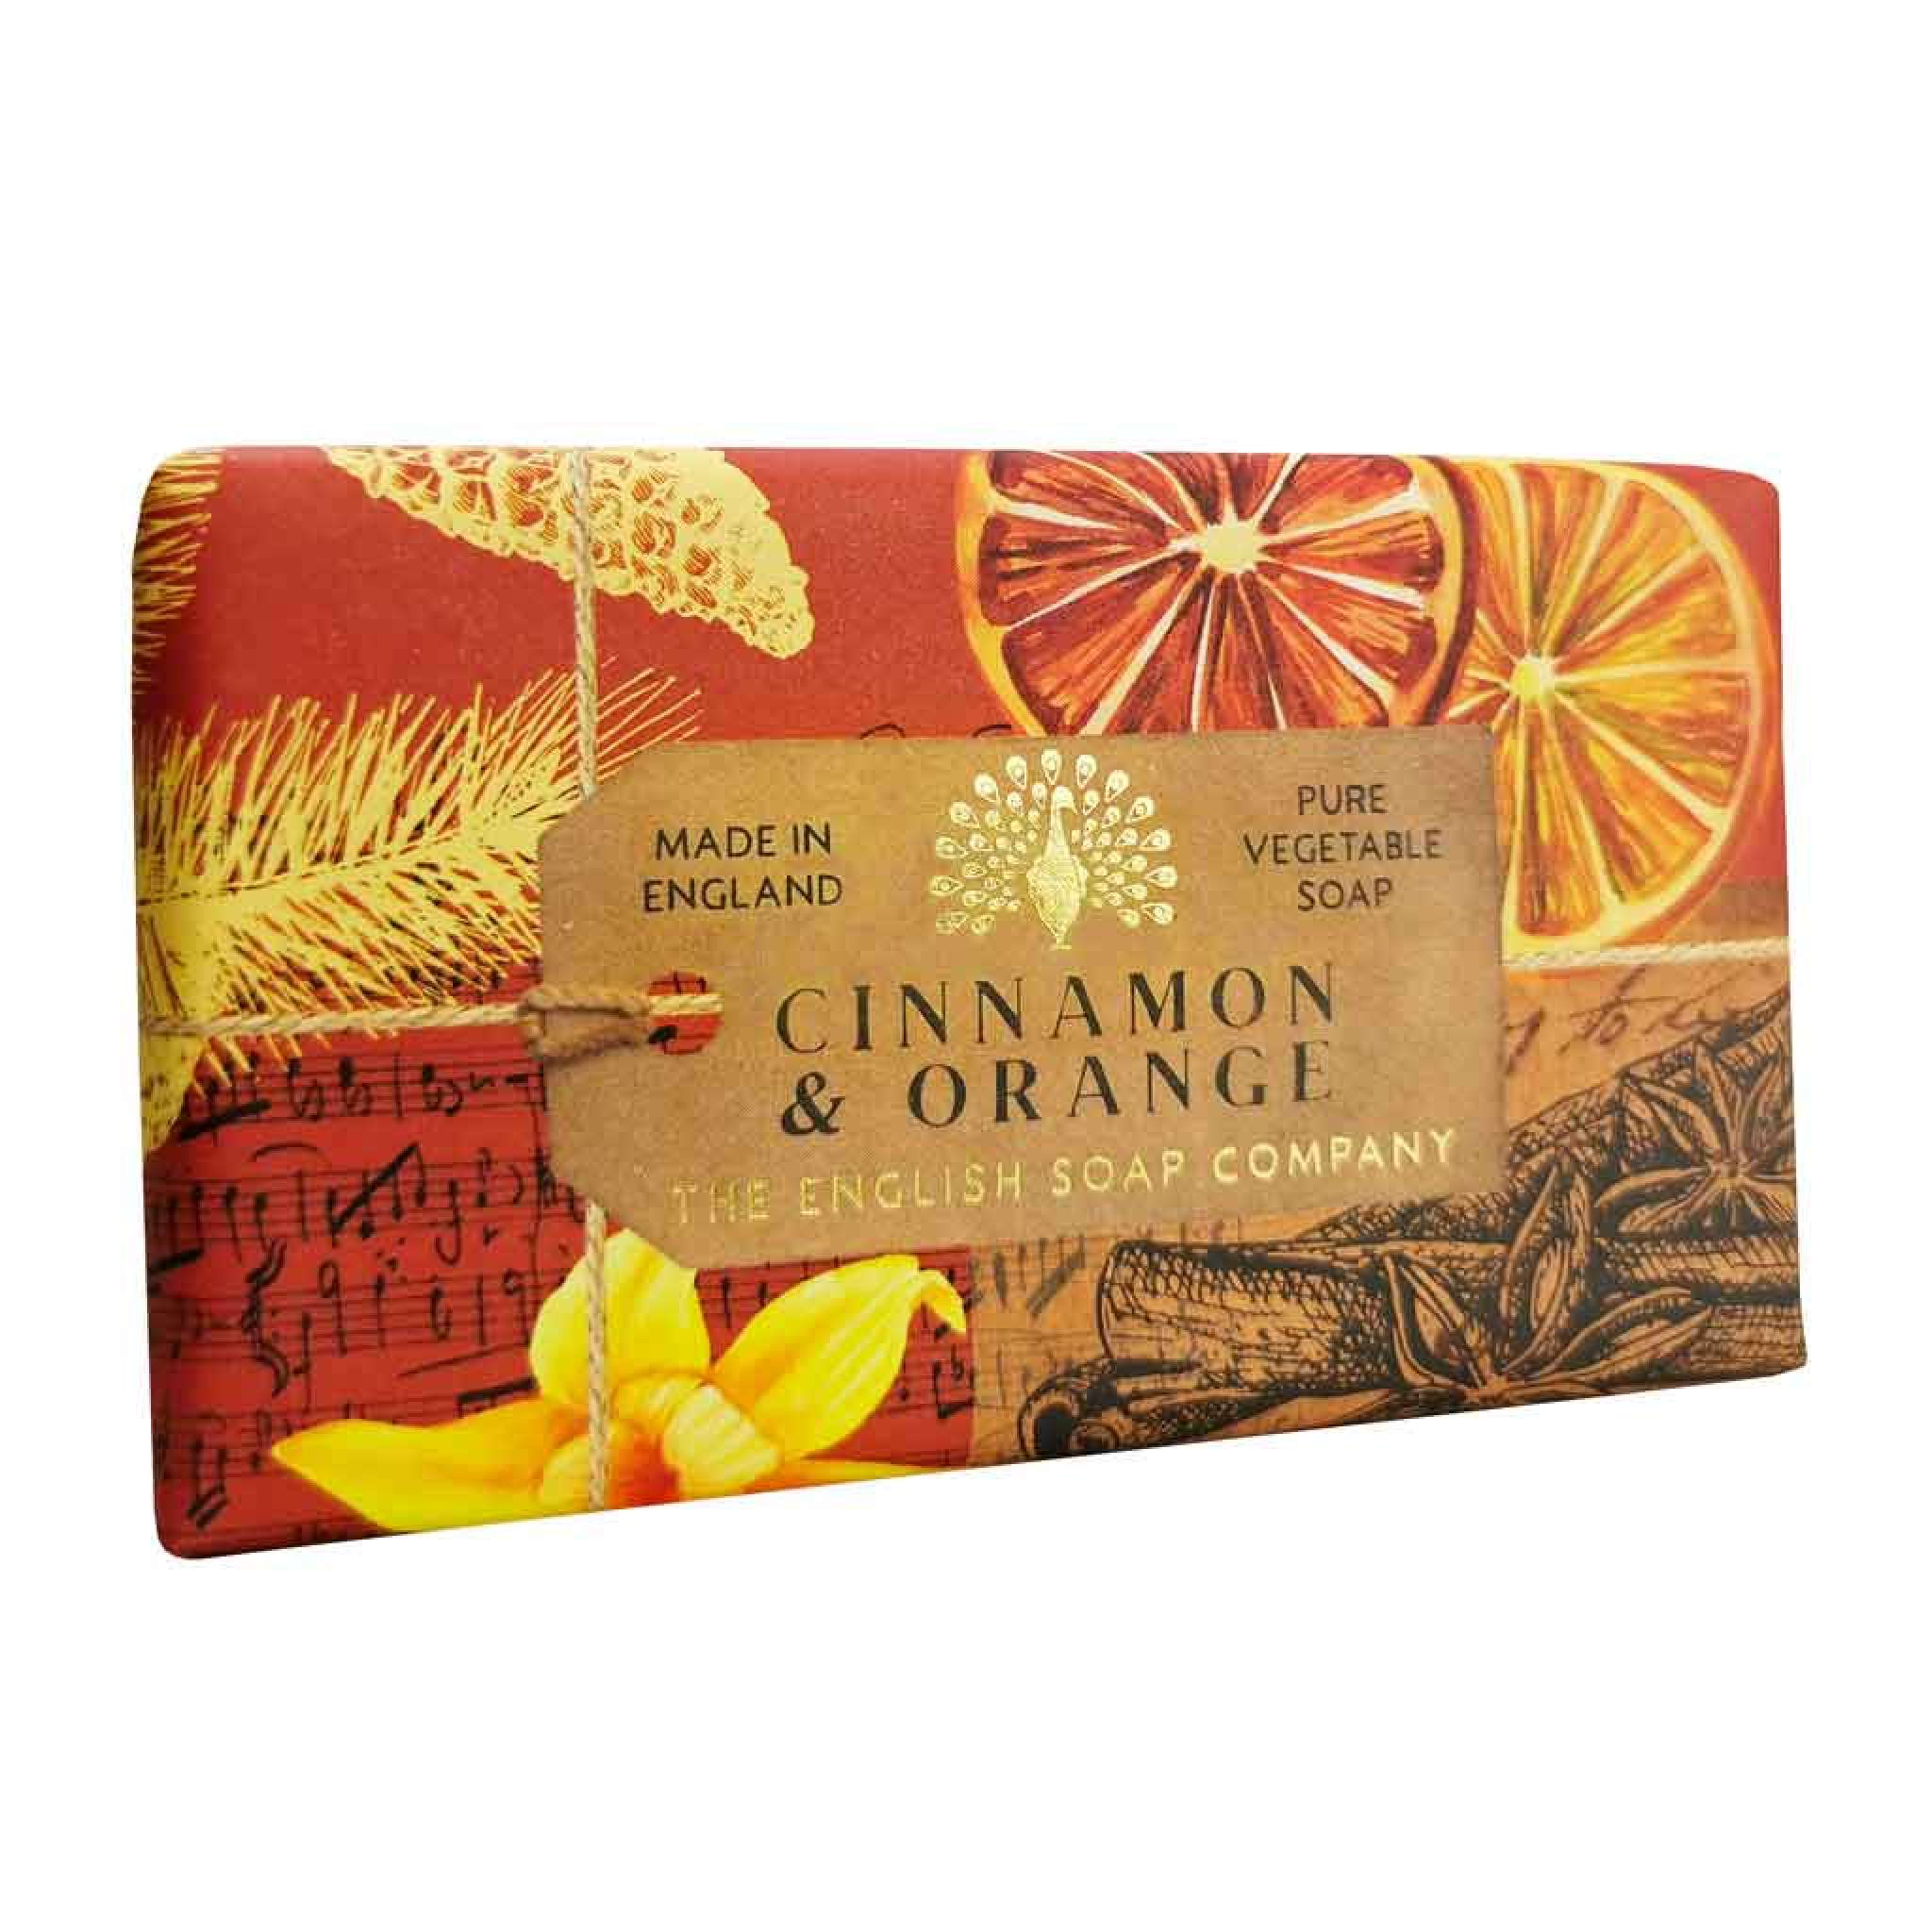 Cinnamon & Orange Anniversary Saippua